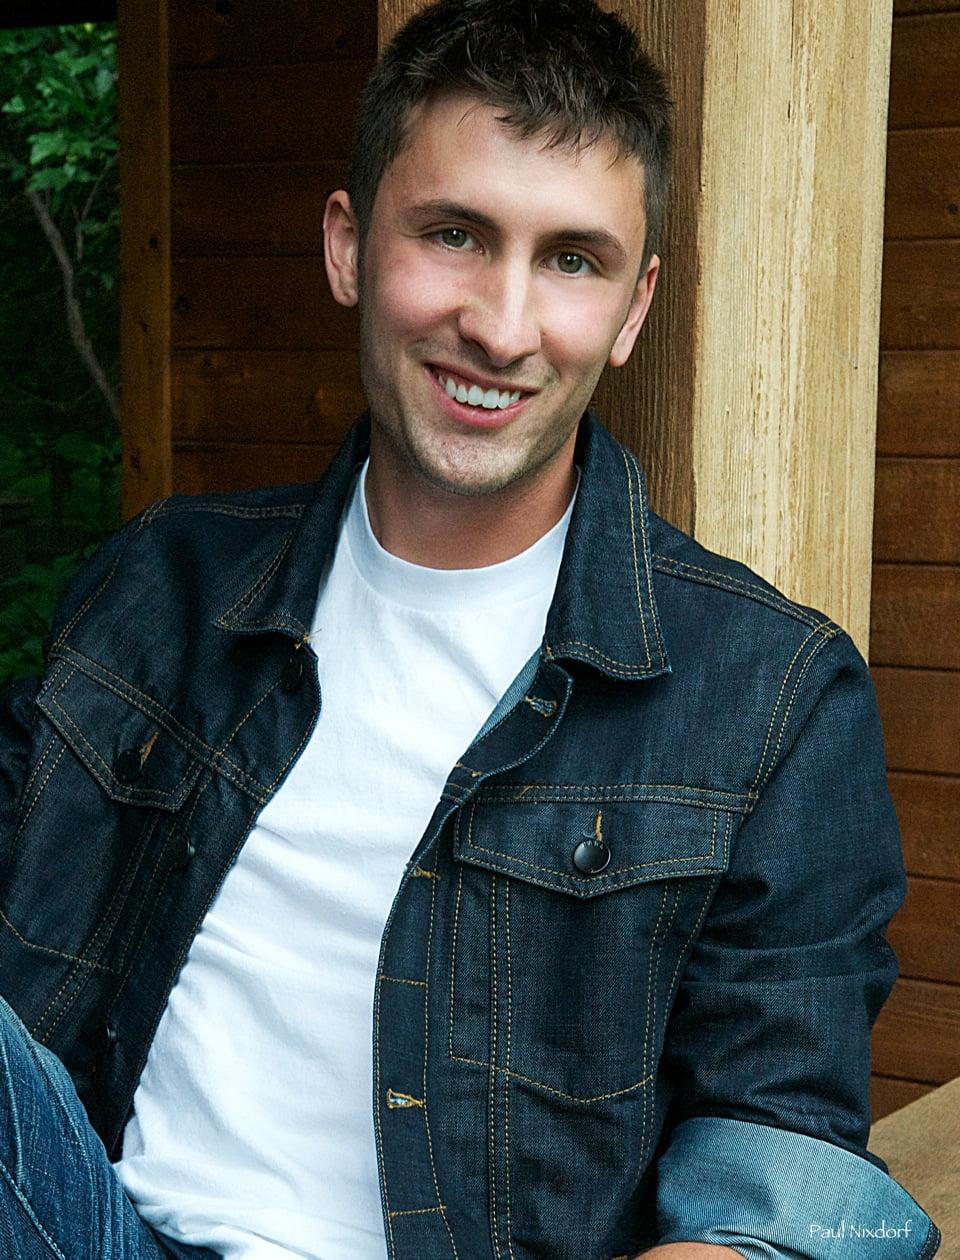 jockey-life-white-crew-neck-t-shirts-with-blue-jean-jacket